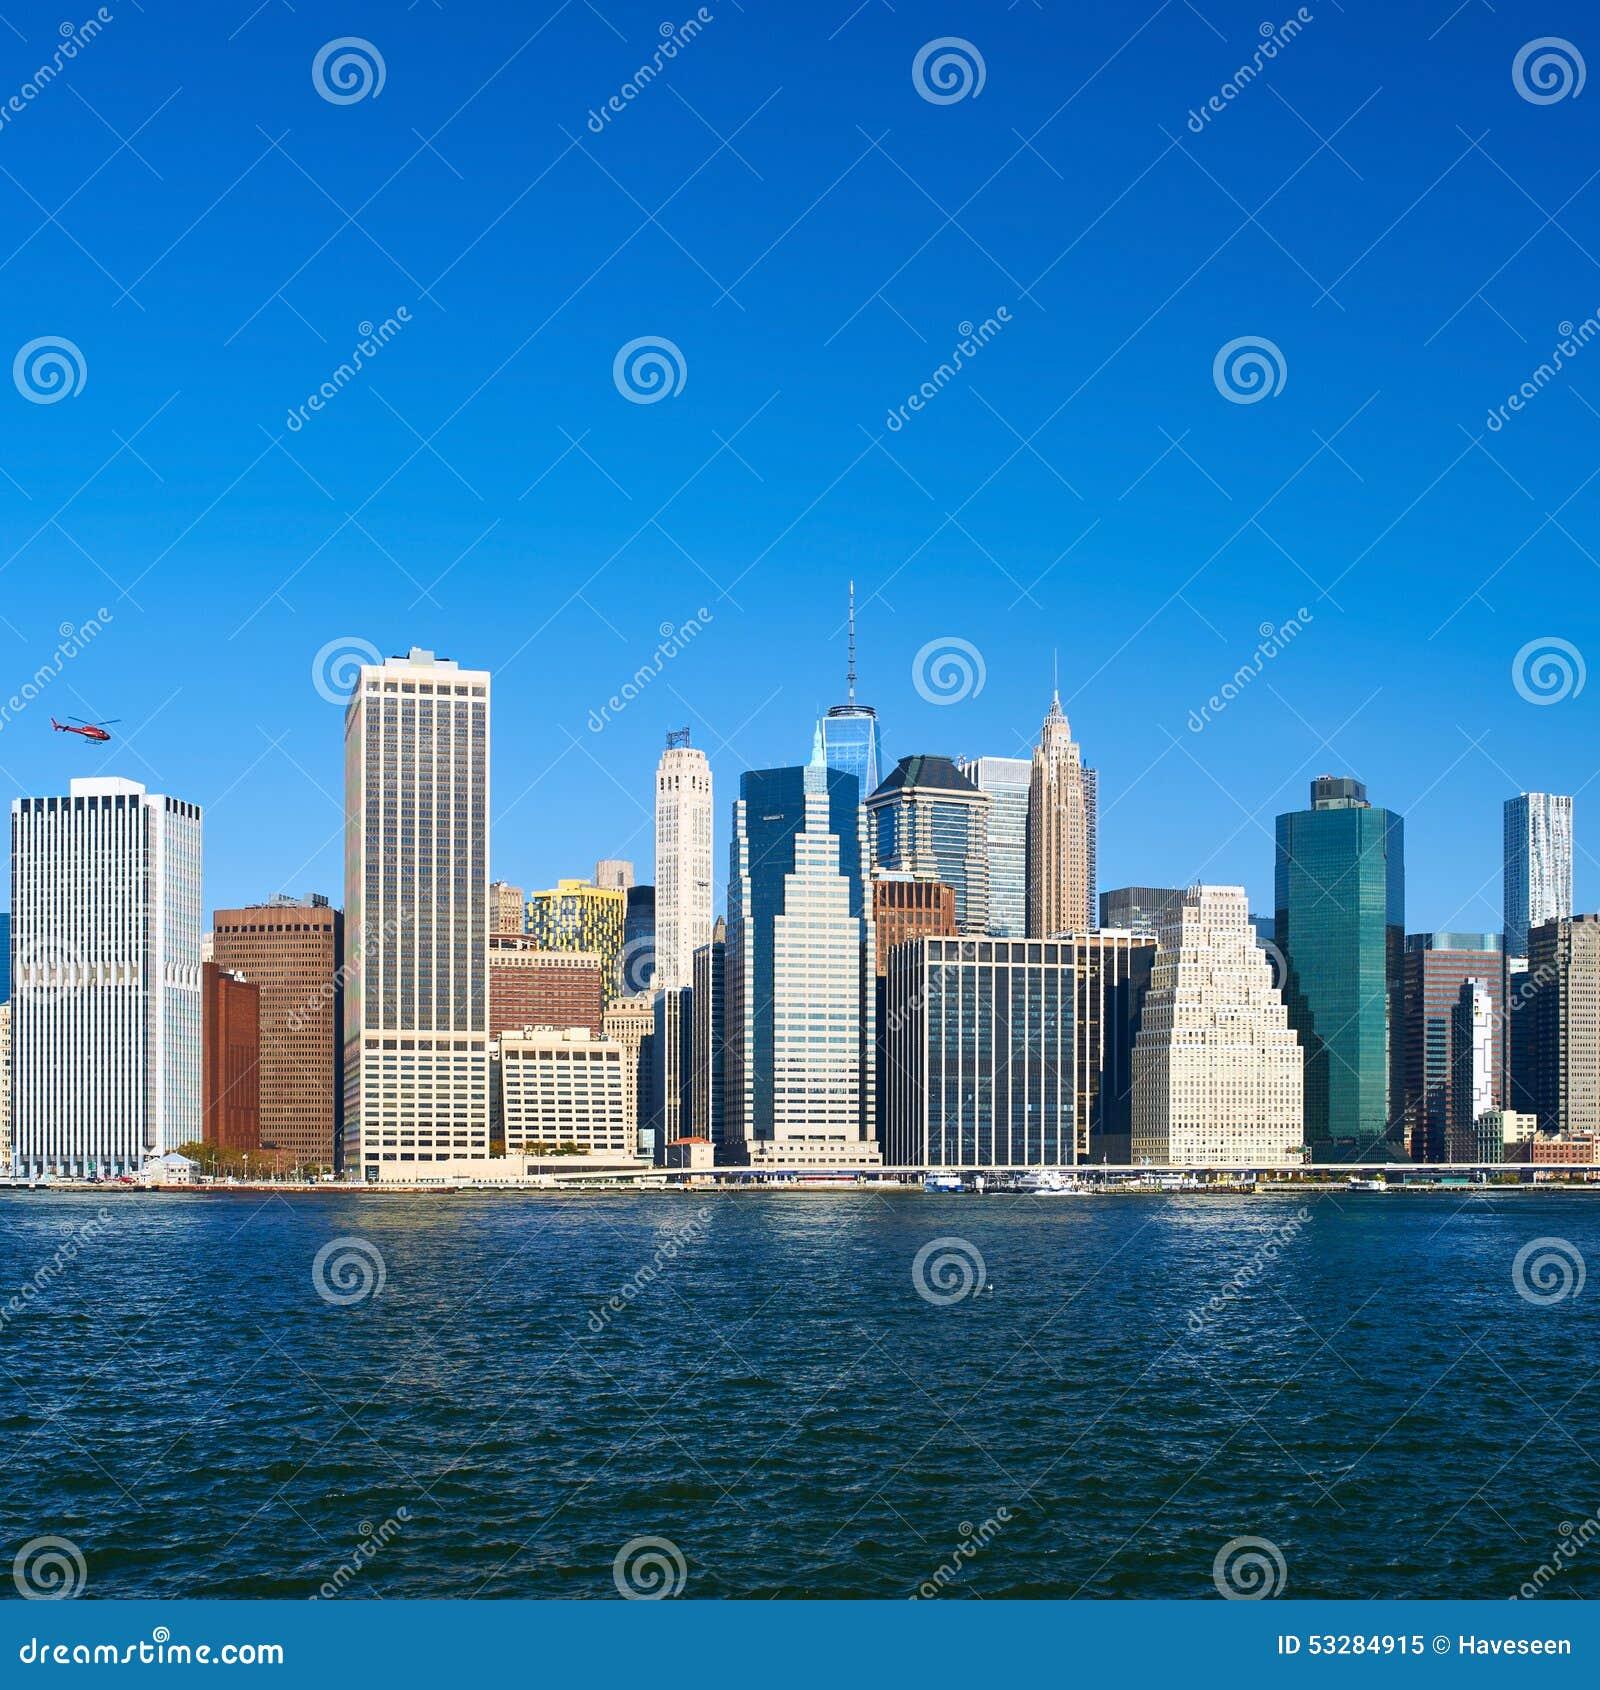 new york skyline view - photo #36